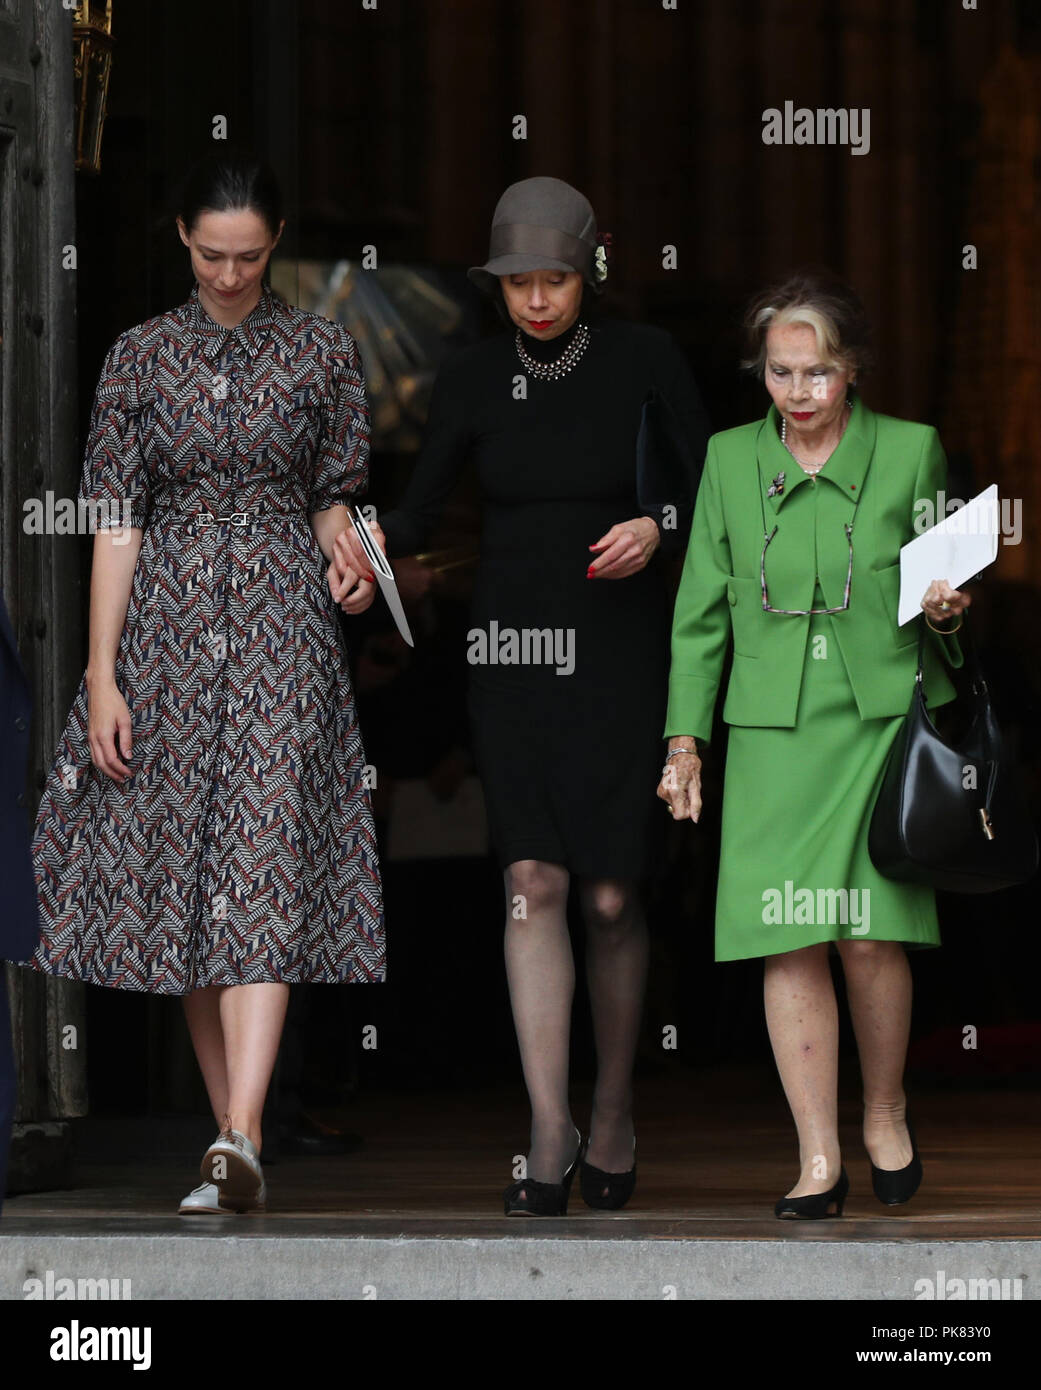 maria london escort